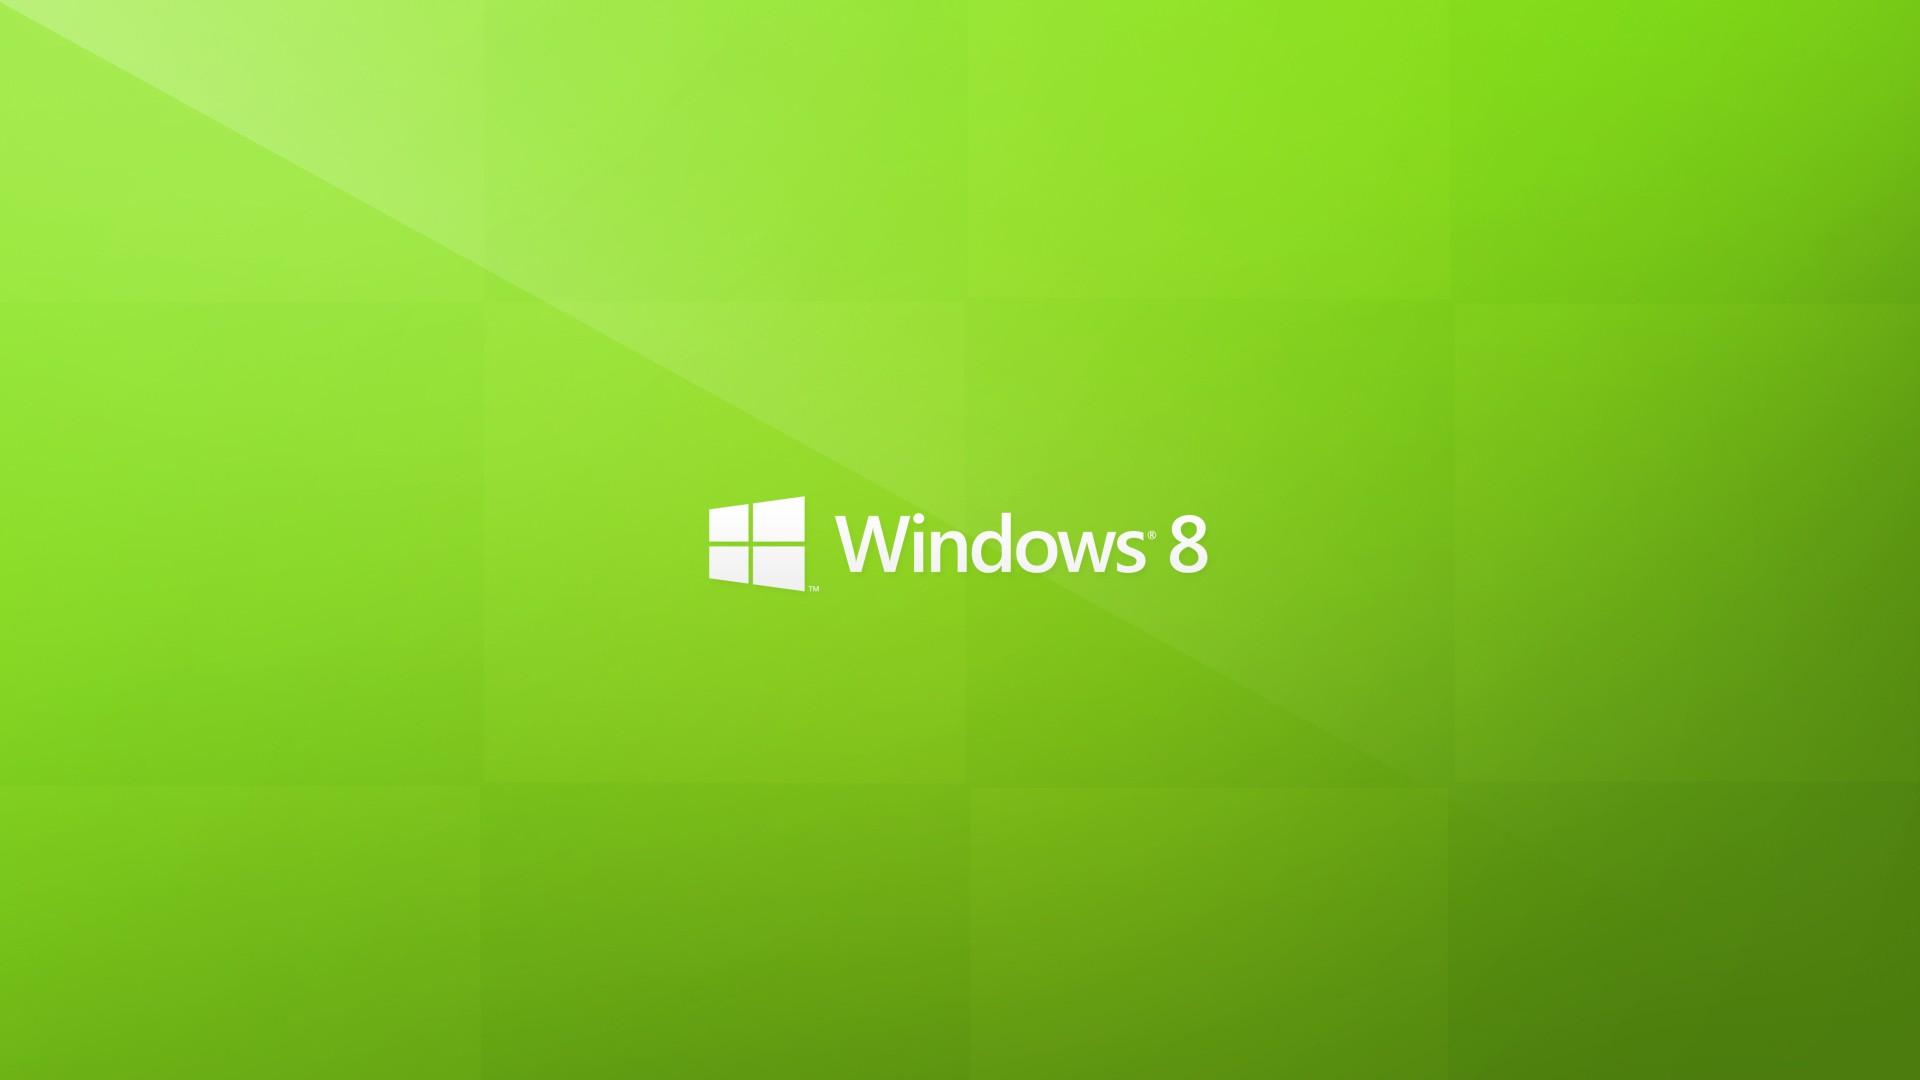 animated wallpaper windows 8 hd